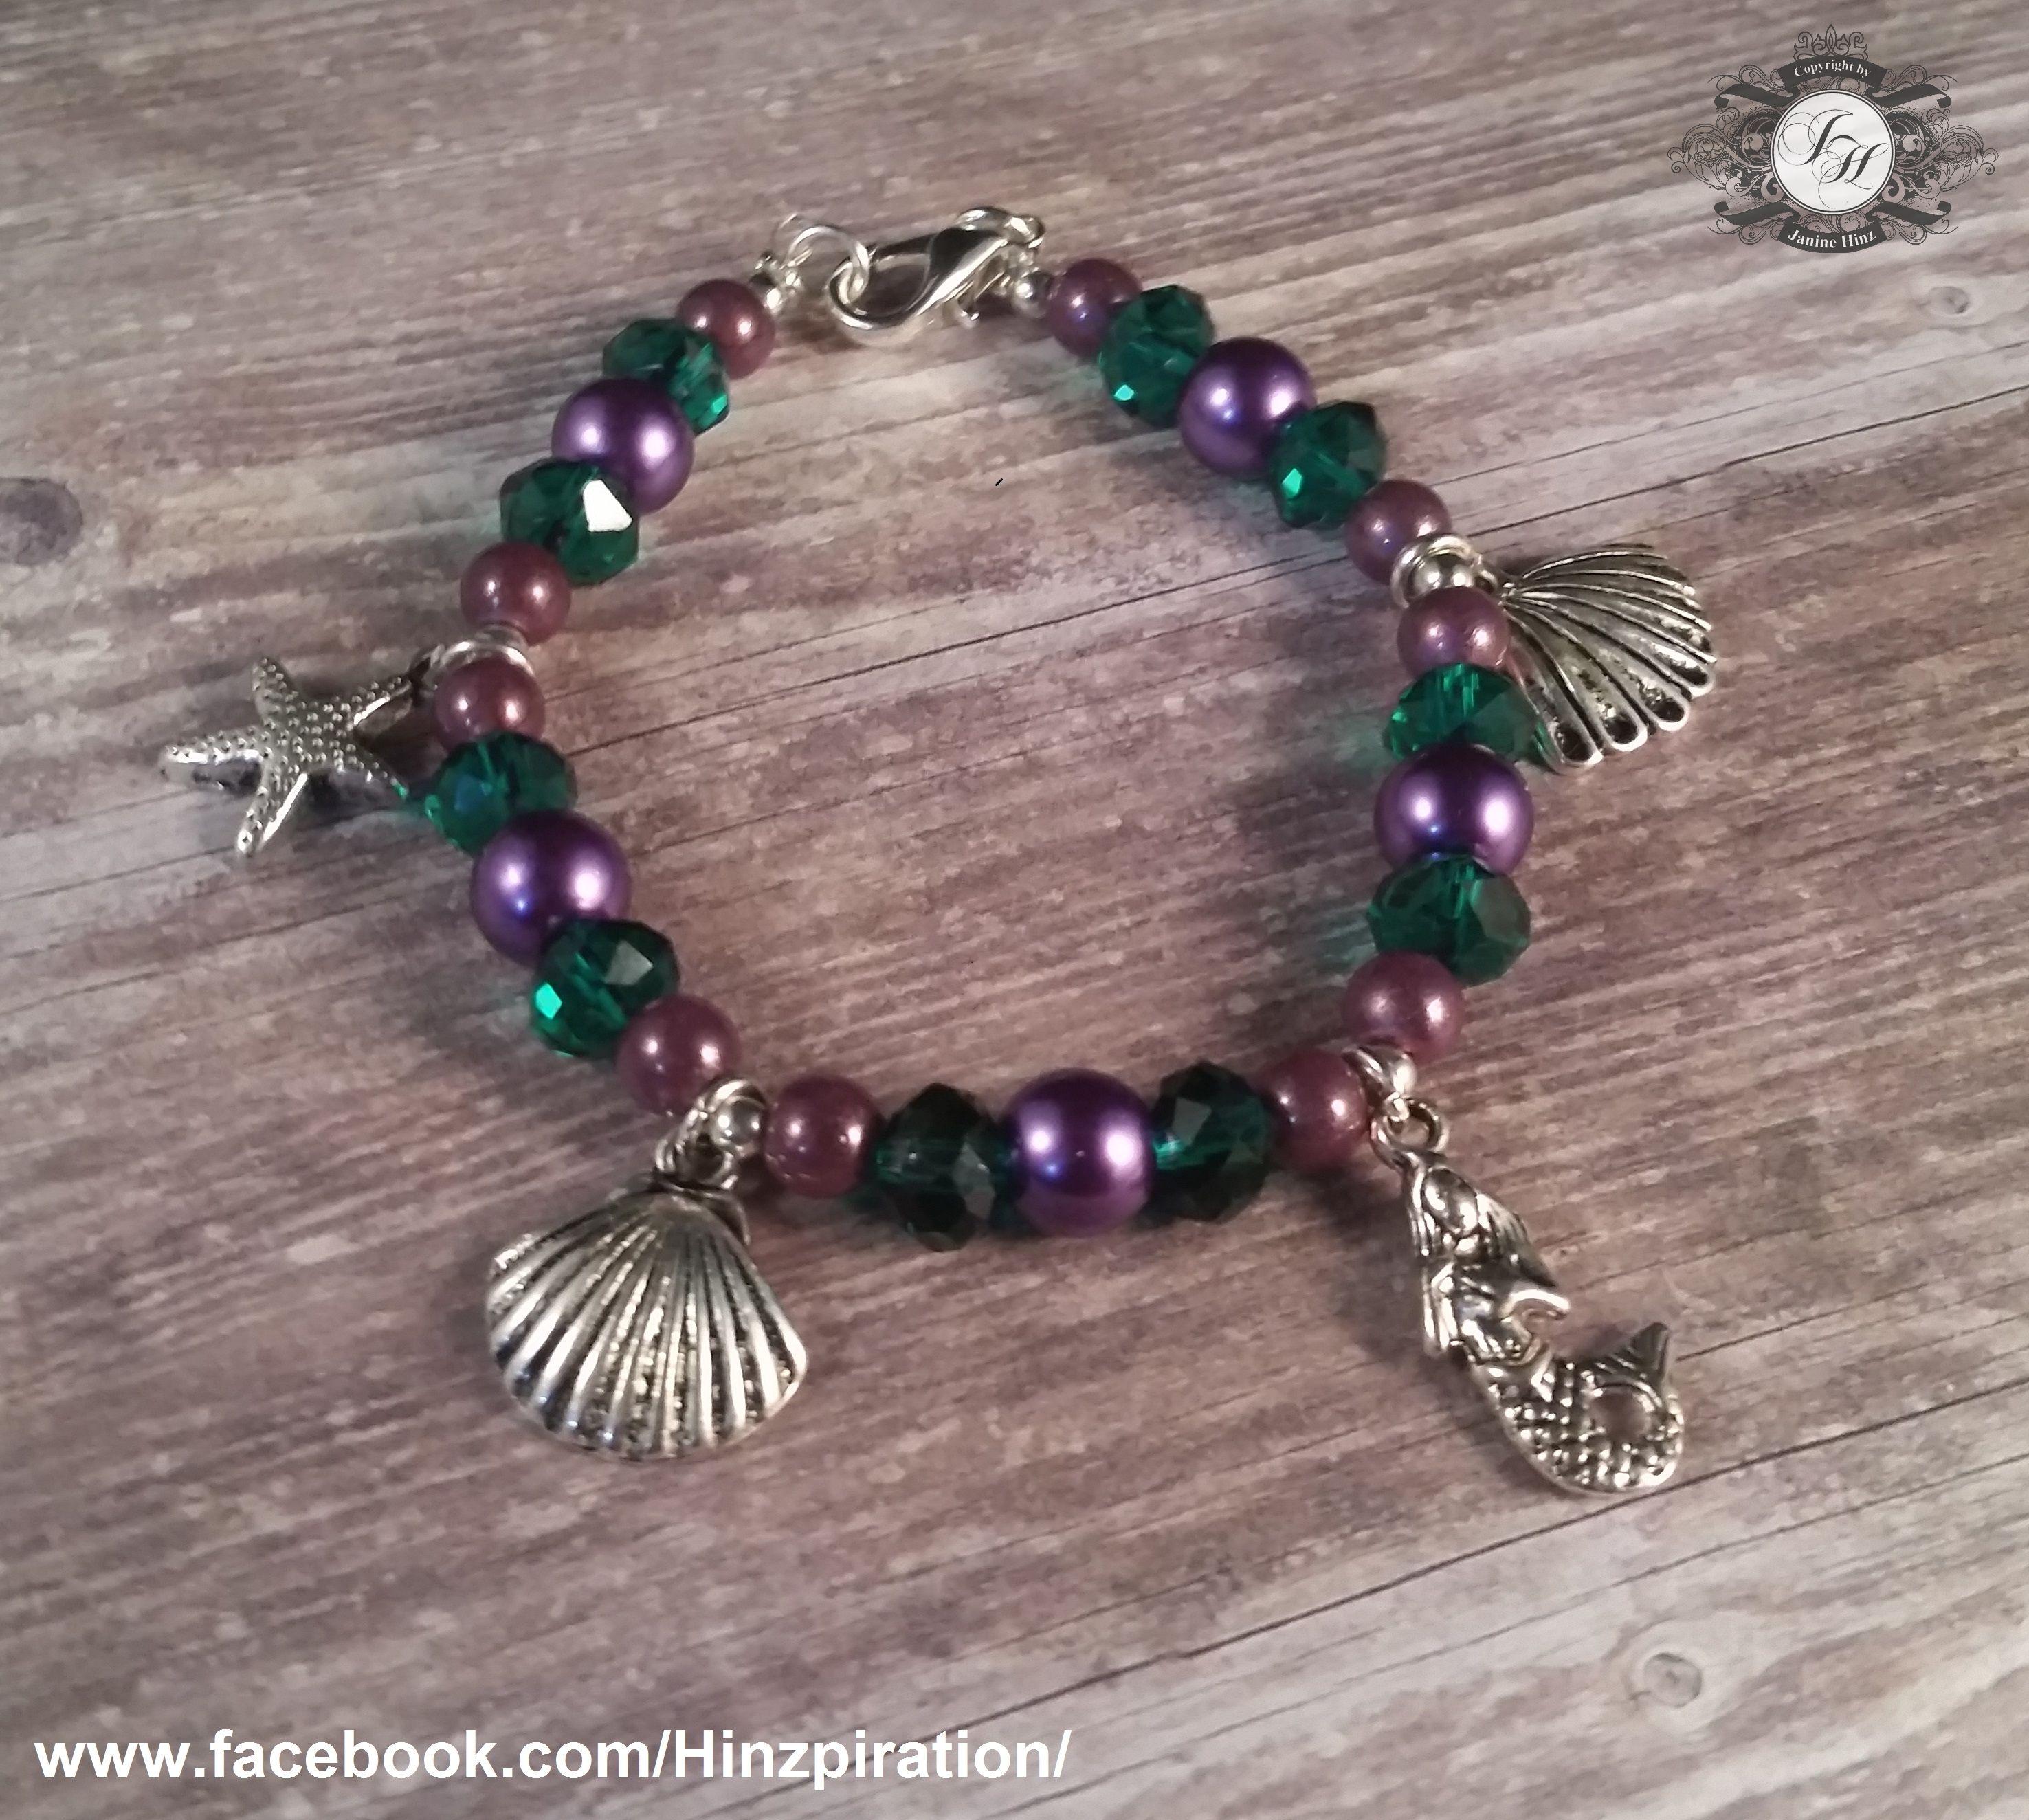 Märchen-Armband: Die kleine Meerjungfrau